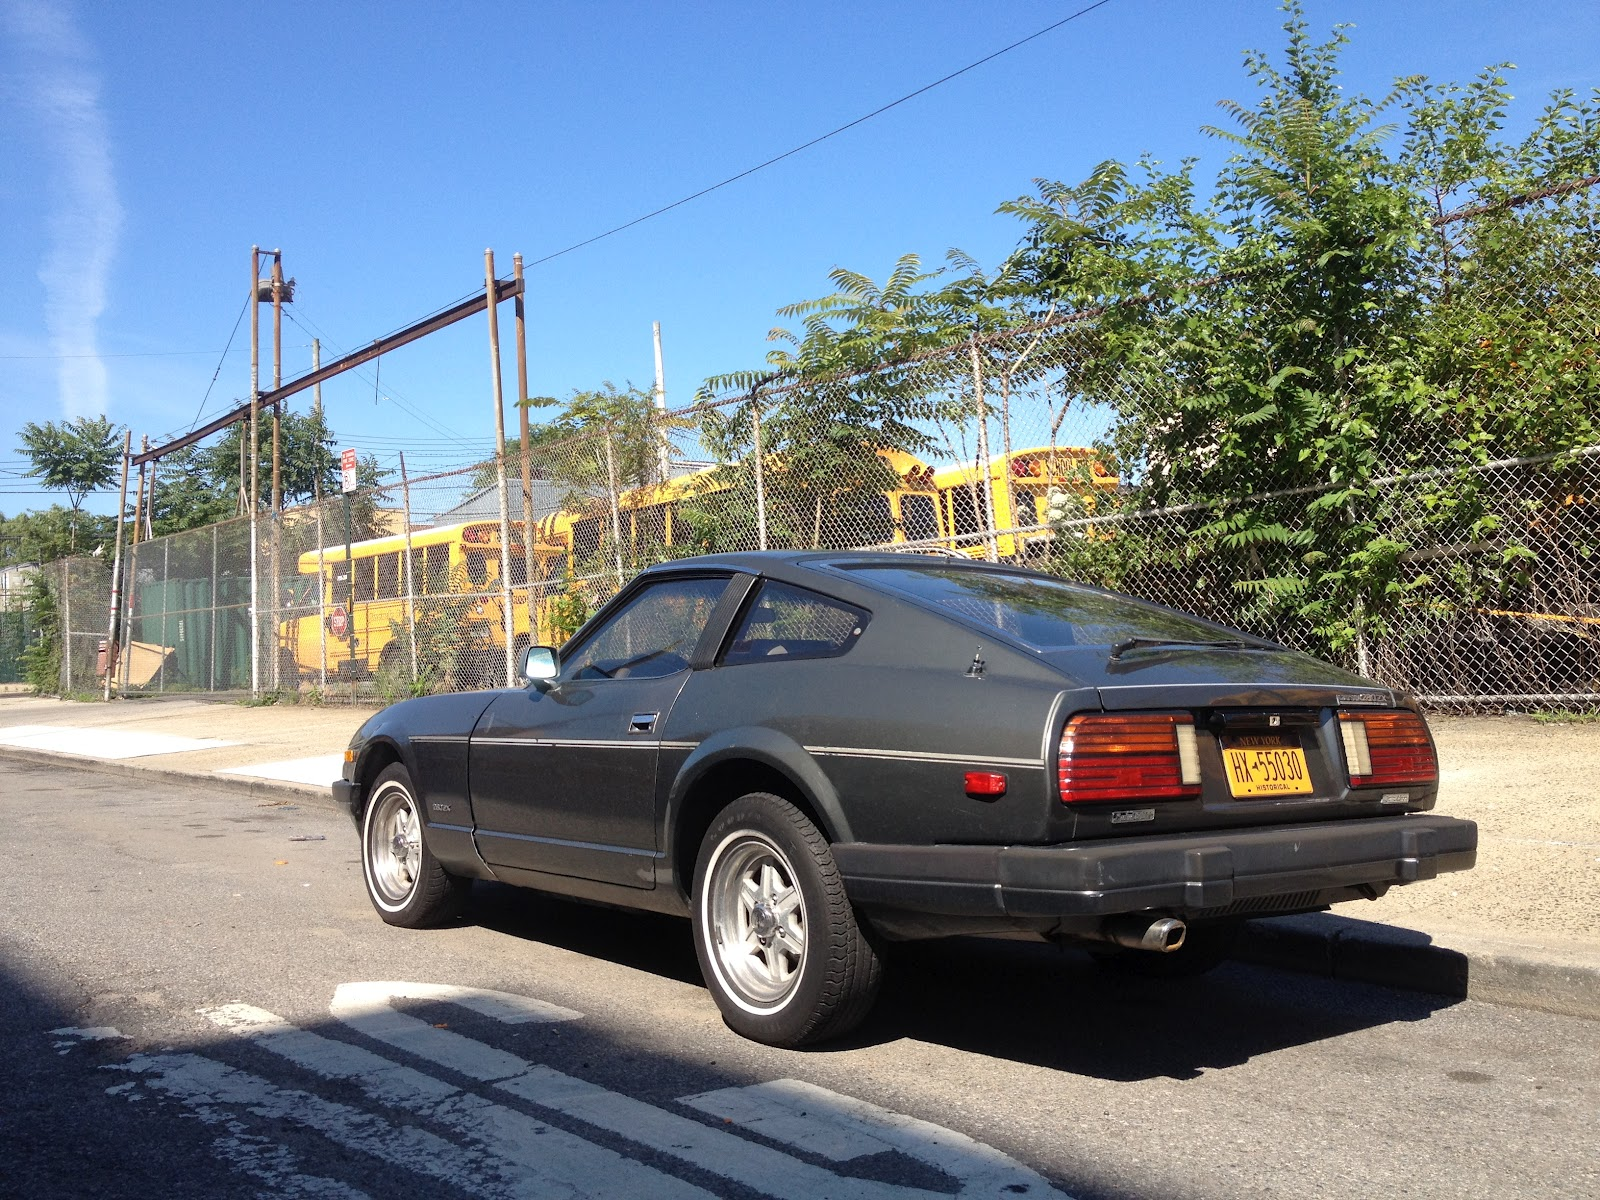 CSCB Home: 1982 Datsun 280ZX